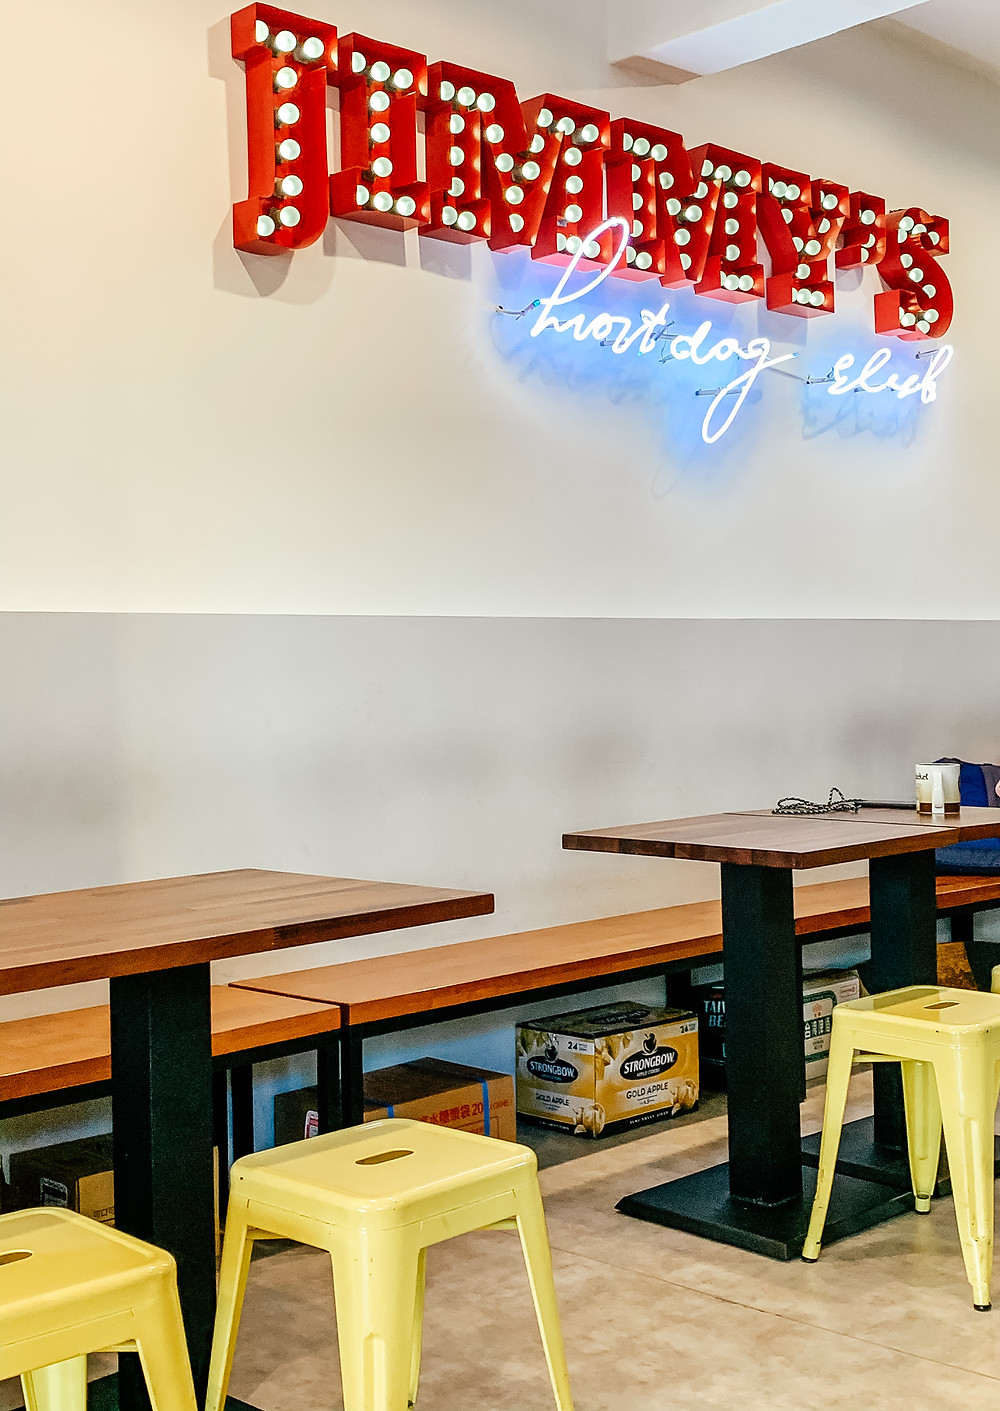 Jimmy's Hot Dog Club Taipei (A Style Alike)